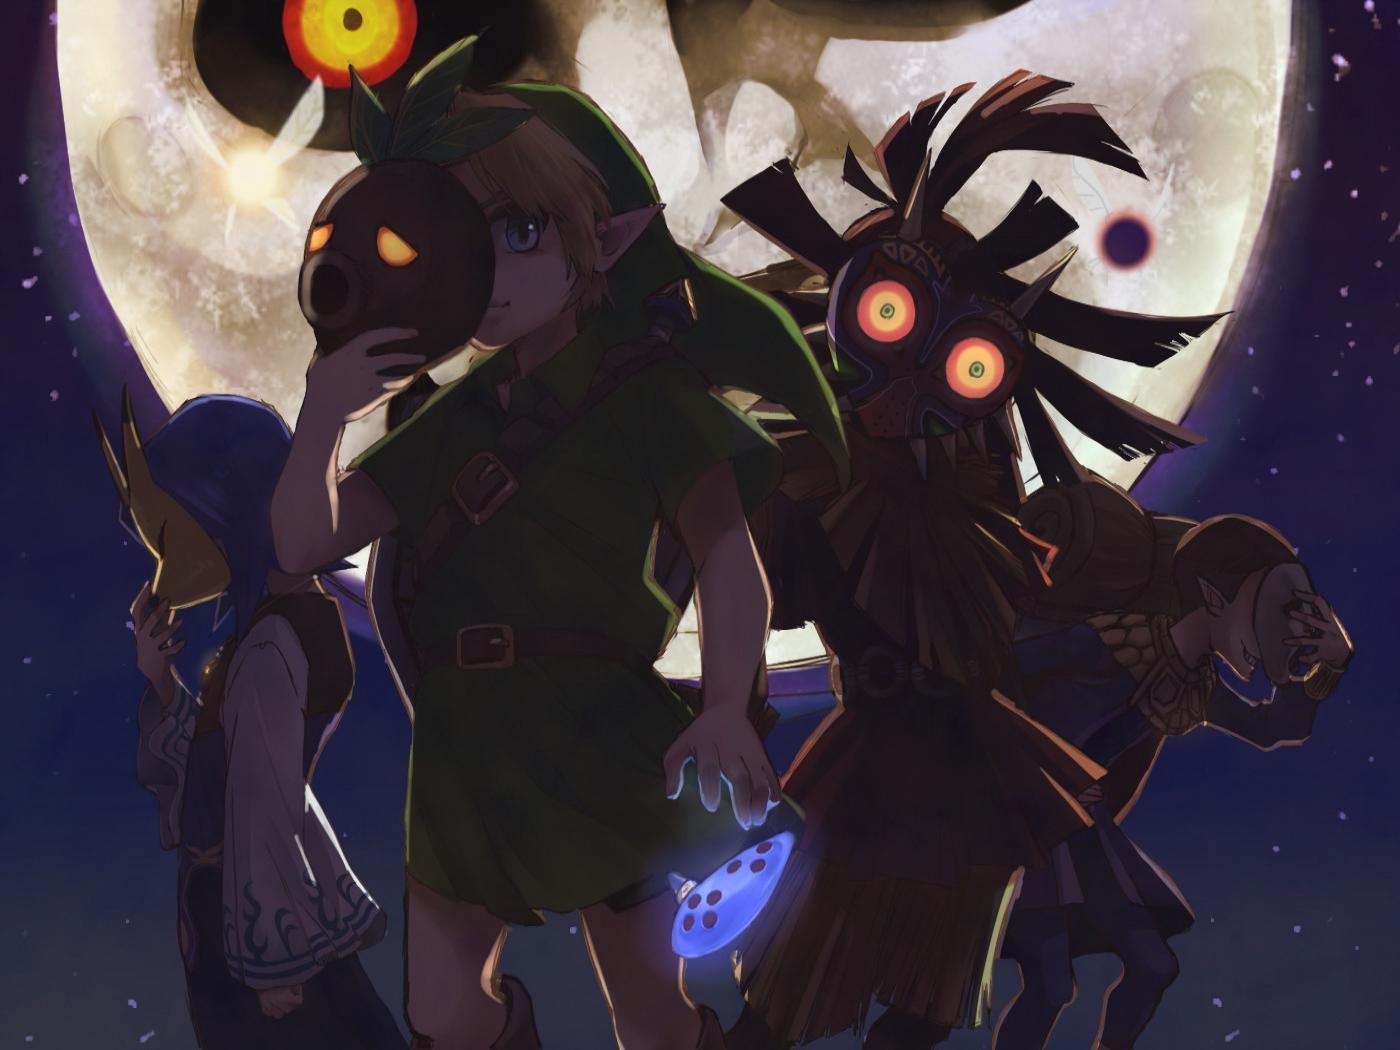 The Legend Of Zelda: Majora's Mask wallpapers HD for ...